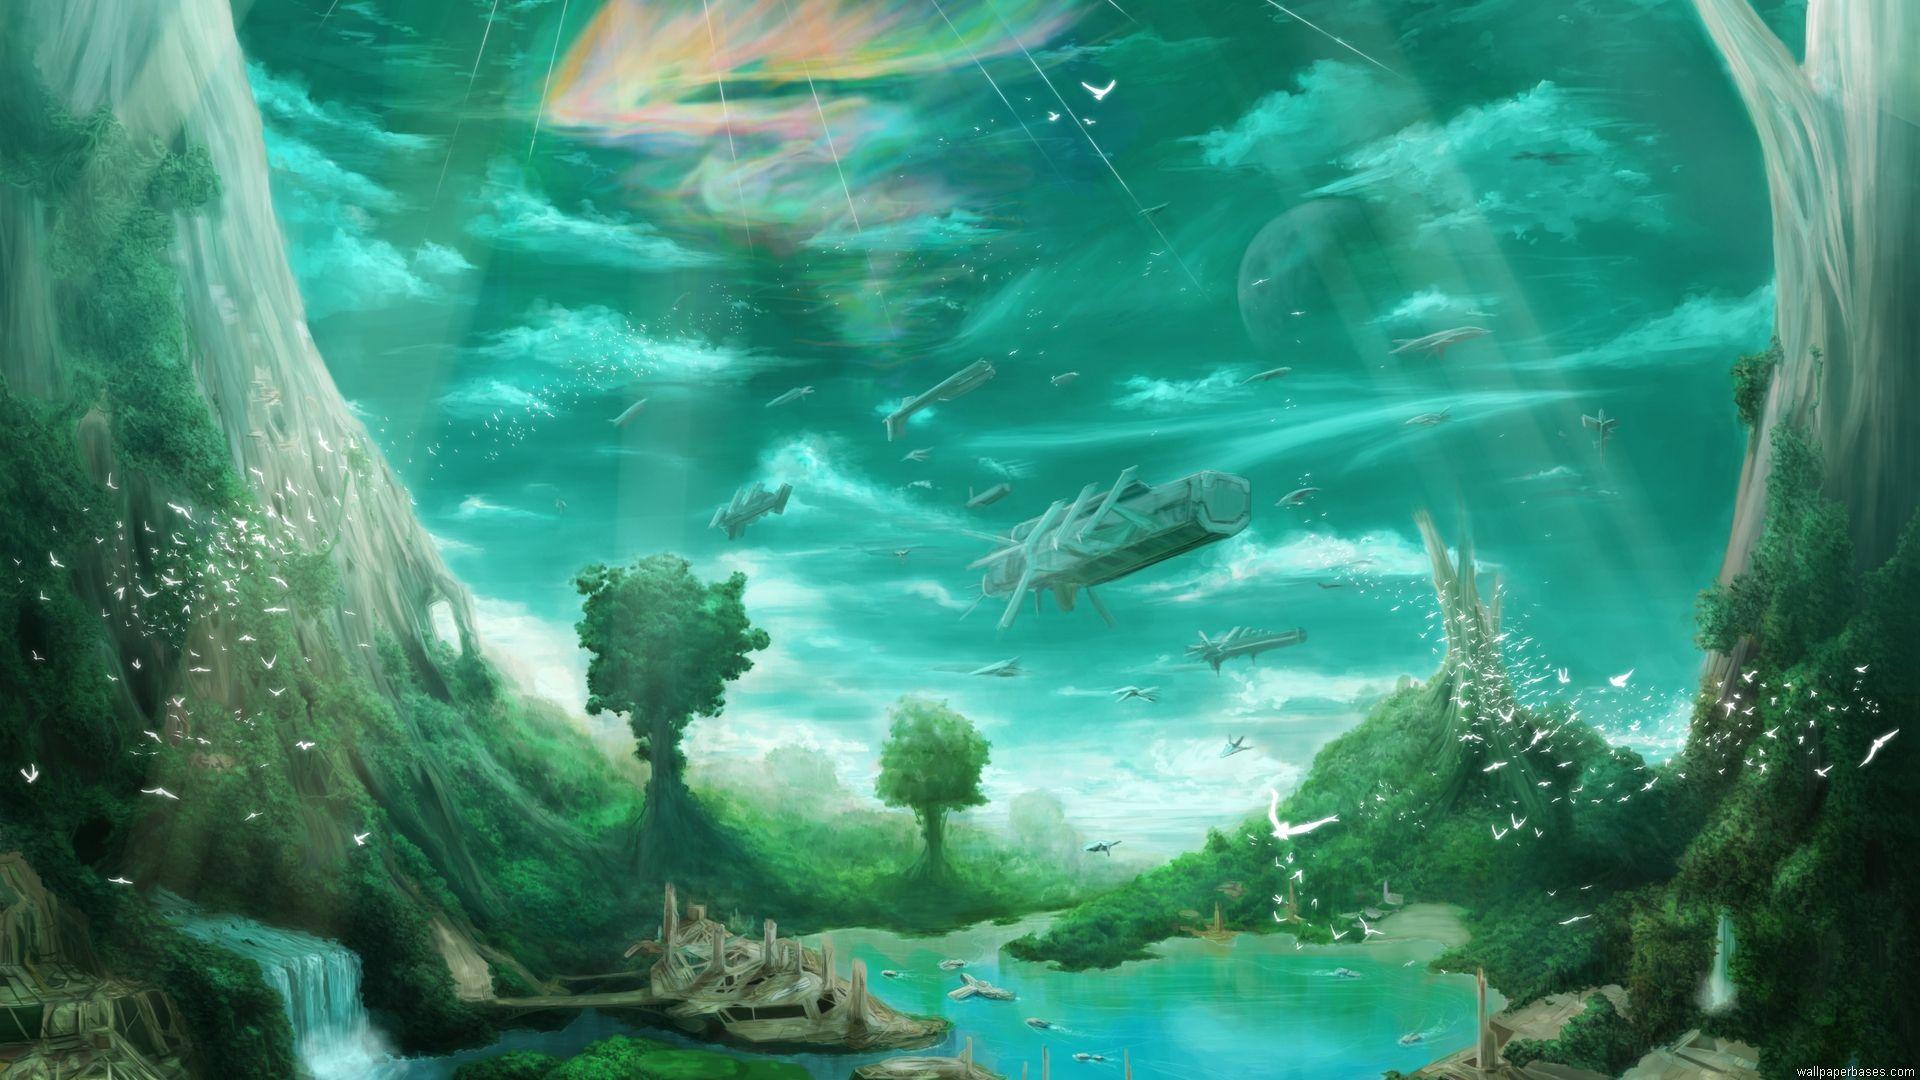 High Quality Computer Wallpapers 60 Fantasy Artwork Underwater Wallpaper Sci Fi Wallpaper